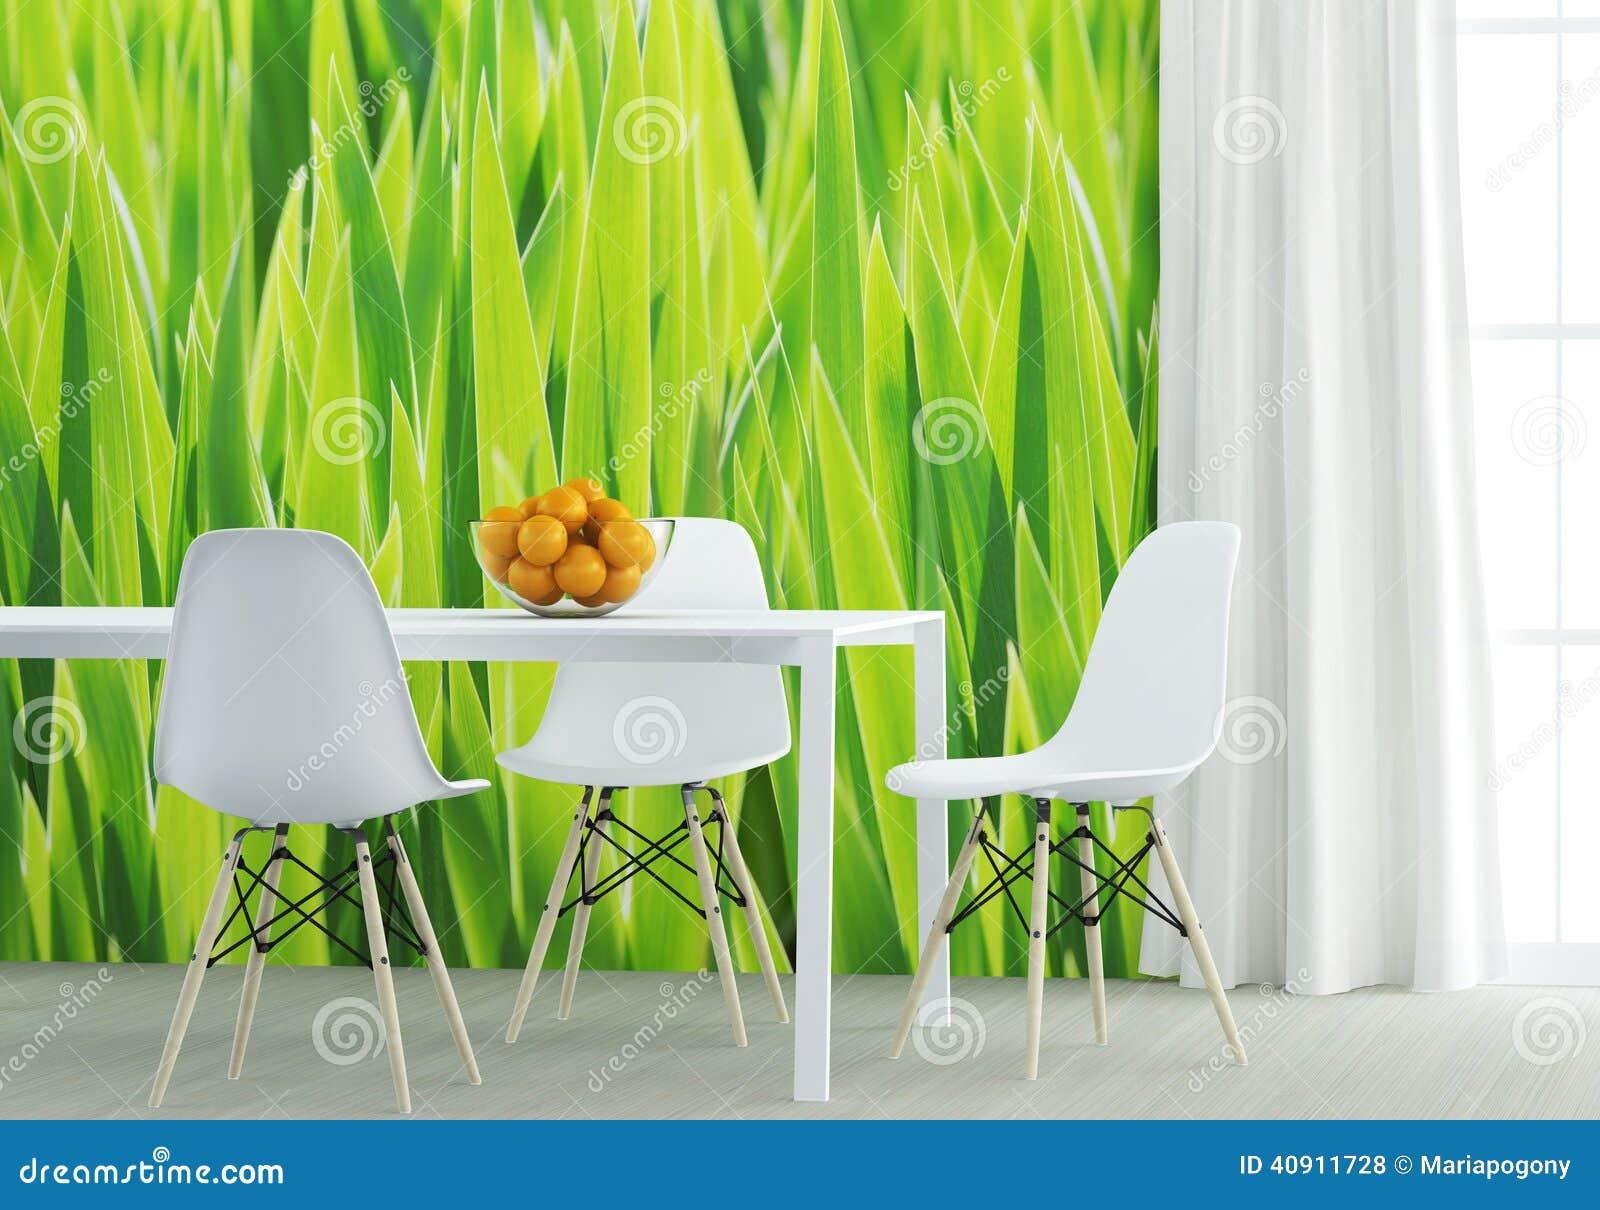 Groene Keuken Muur : Groene Keuken Muur : Houten Stoel Tegen Groene Muur Stock Foto s Beeld